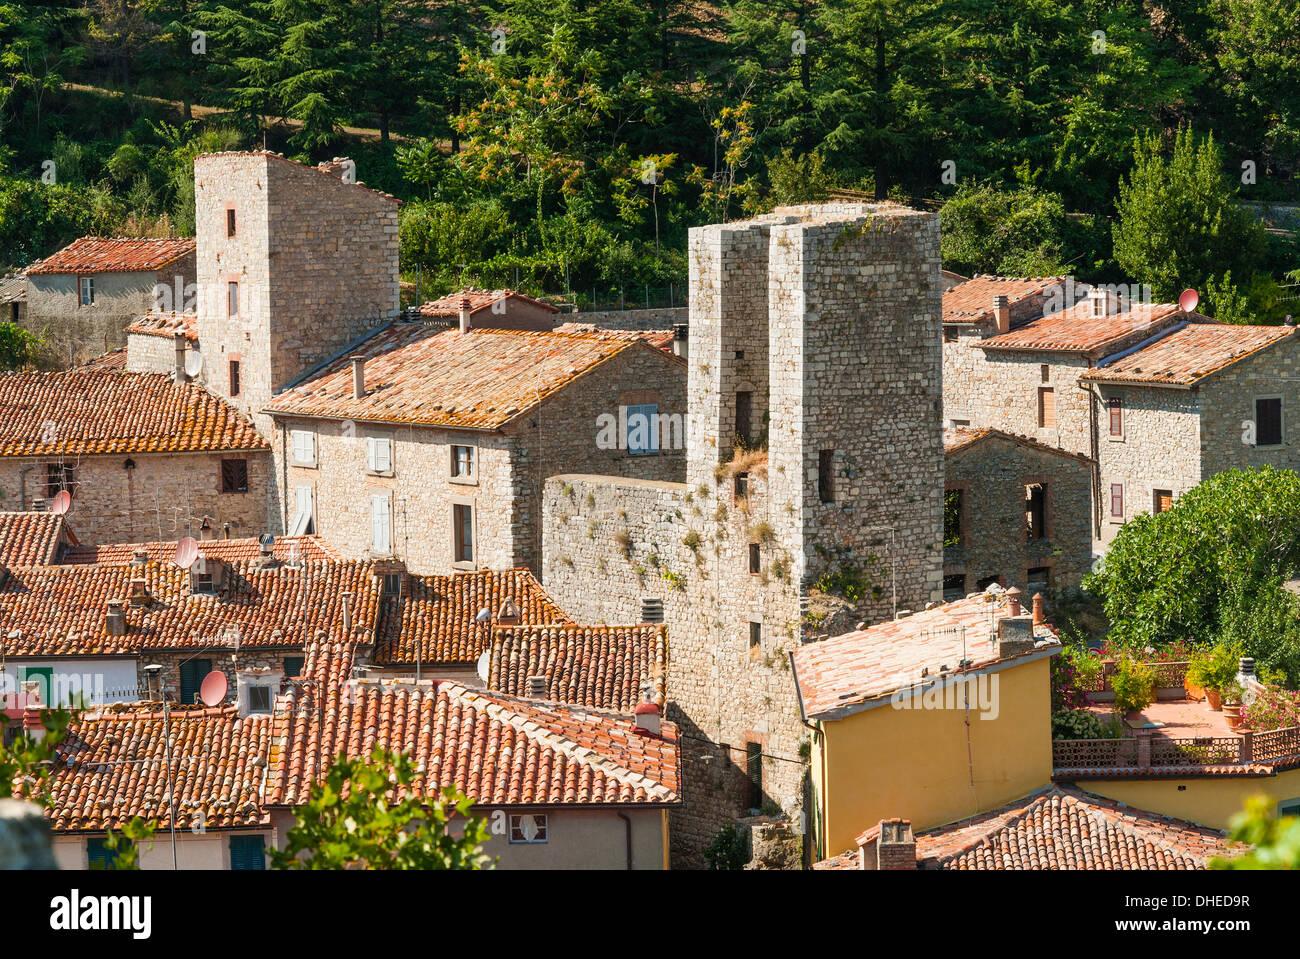 Roccalbegna, Grosseto province, Tuscany, Italy, Europe - Stock Image